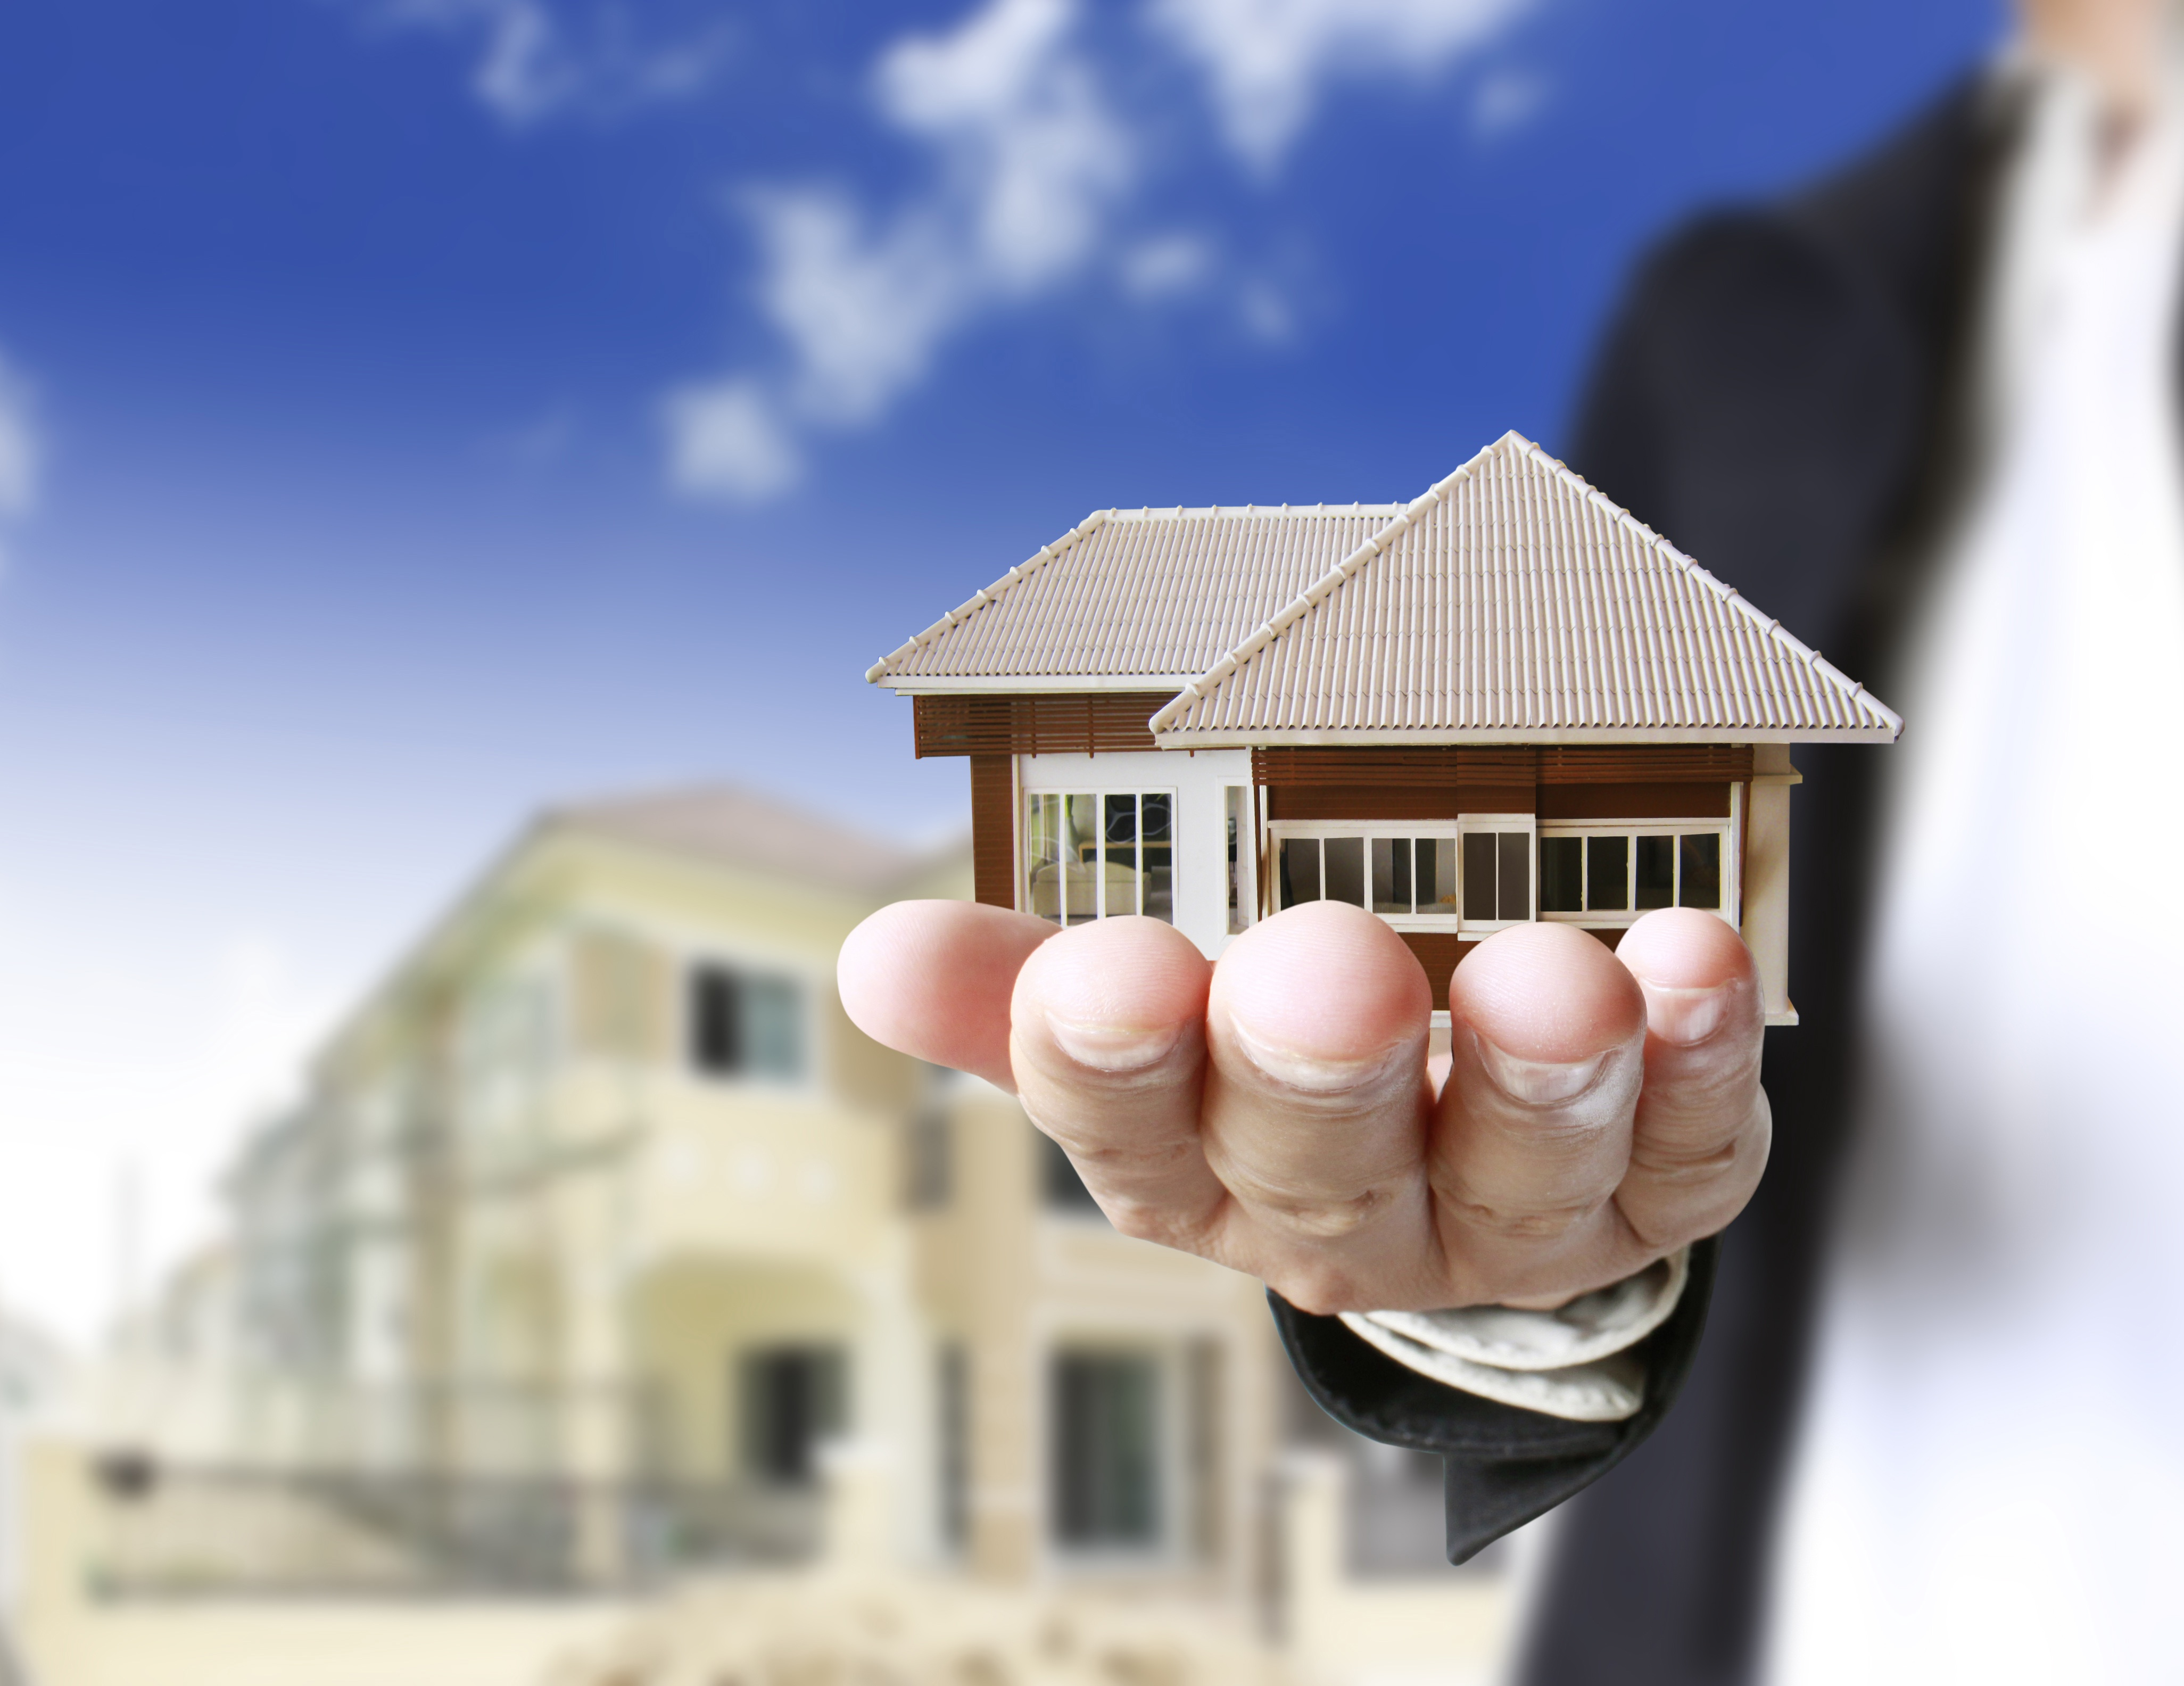 Продажа недвижимости процесс